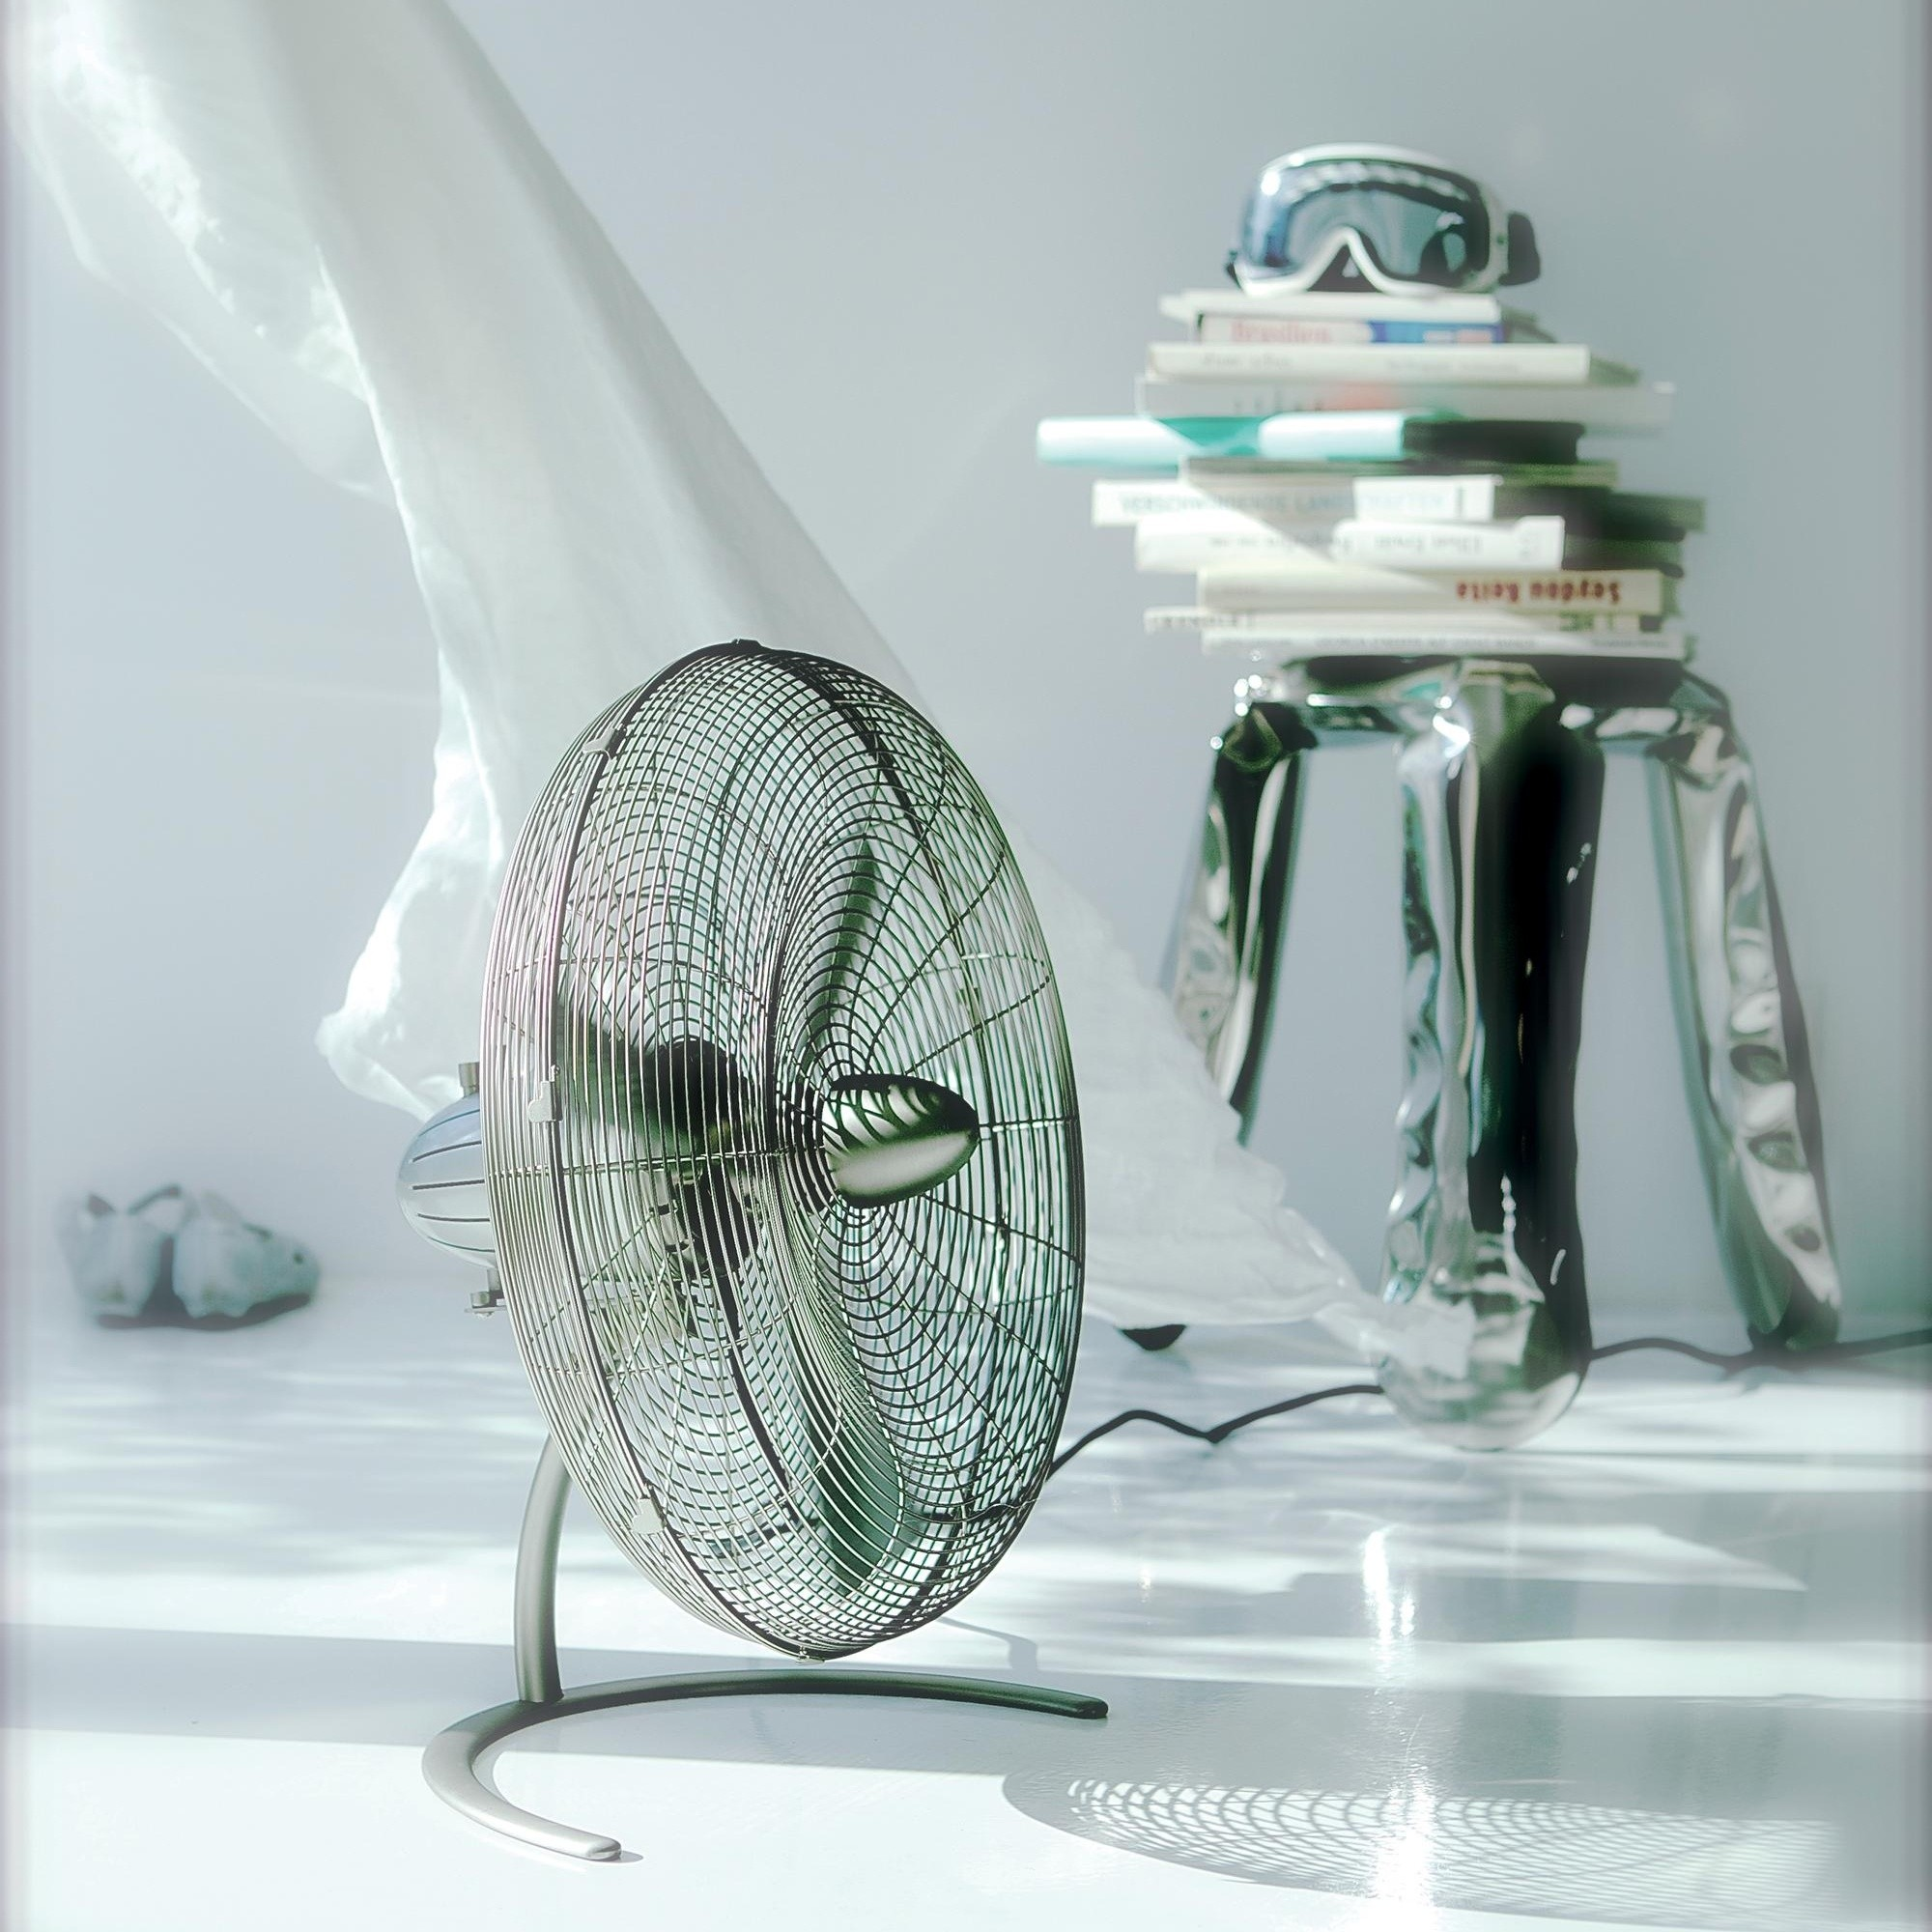 Silber Boden-Ventilator CHARLY LITTLE mit Schwenkfunktion STADLER FORM